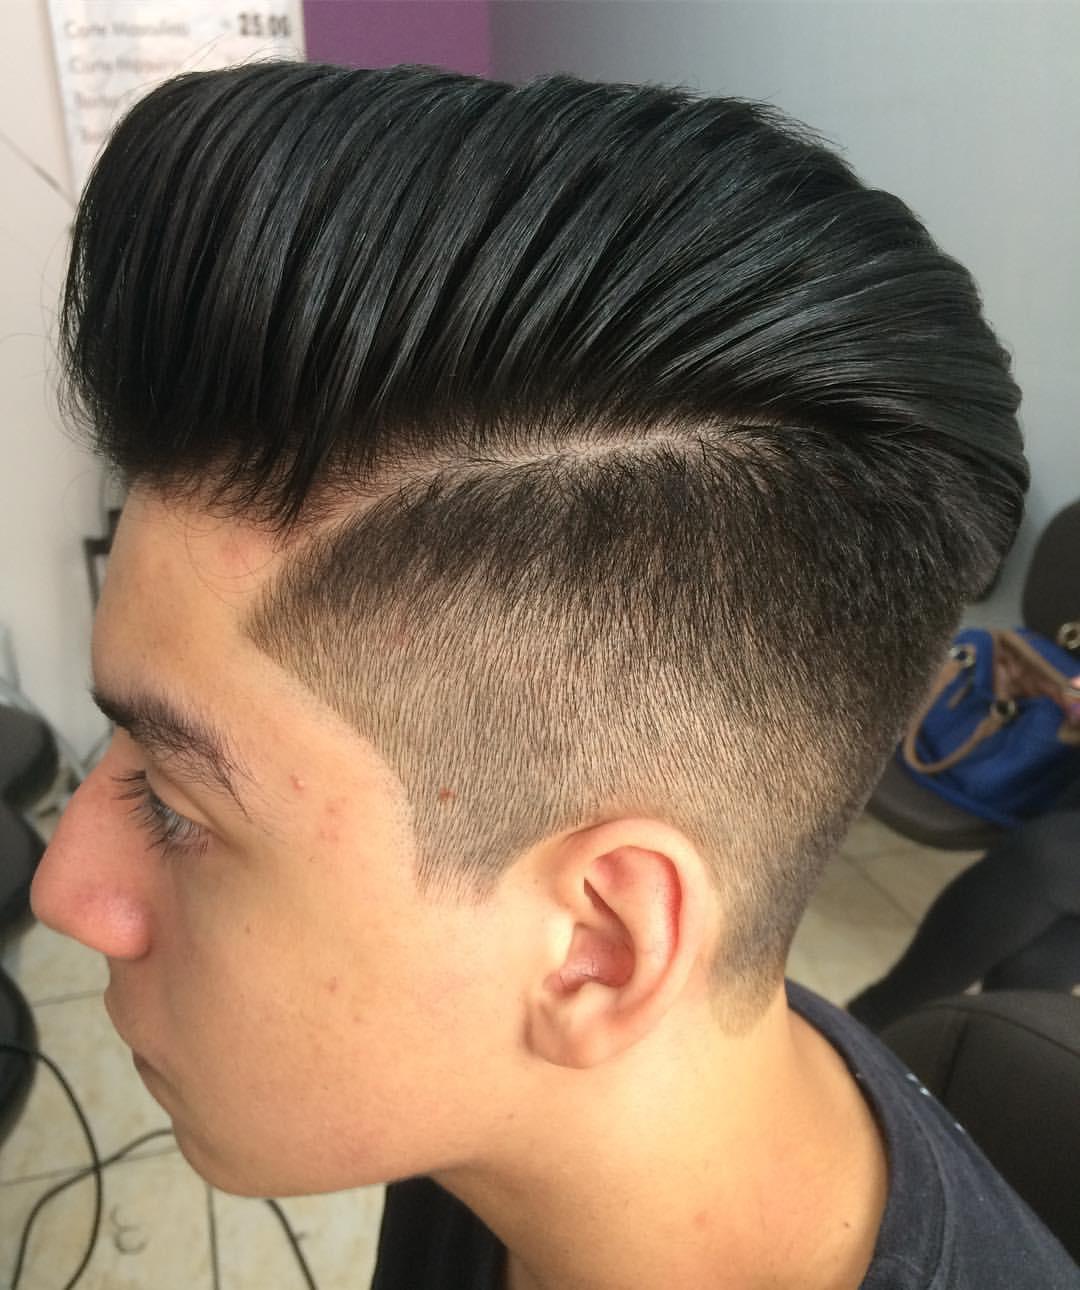 Corte Pompadour... cabelo cabeleireiro(a) barbeiro(a)